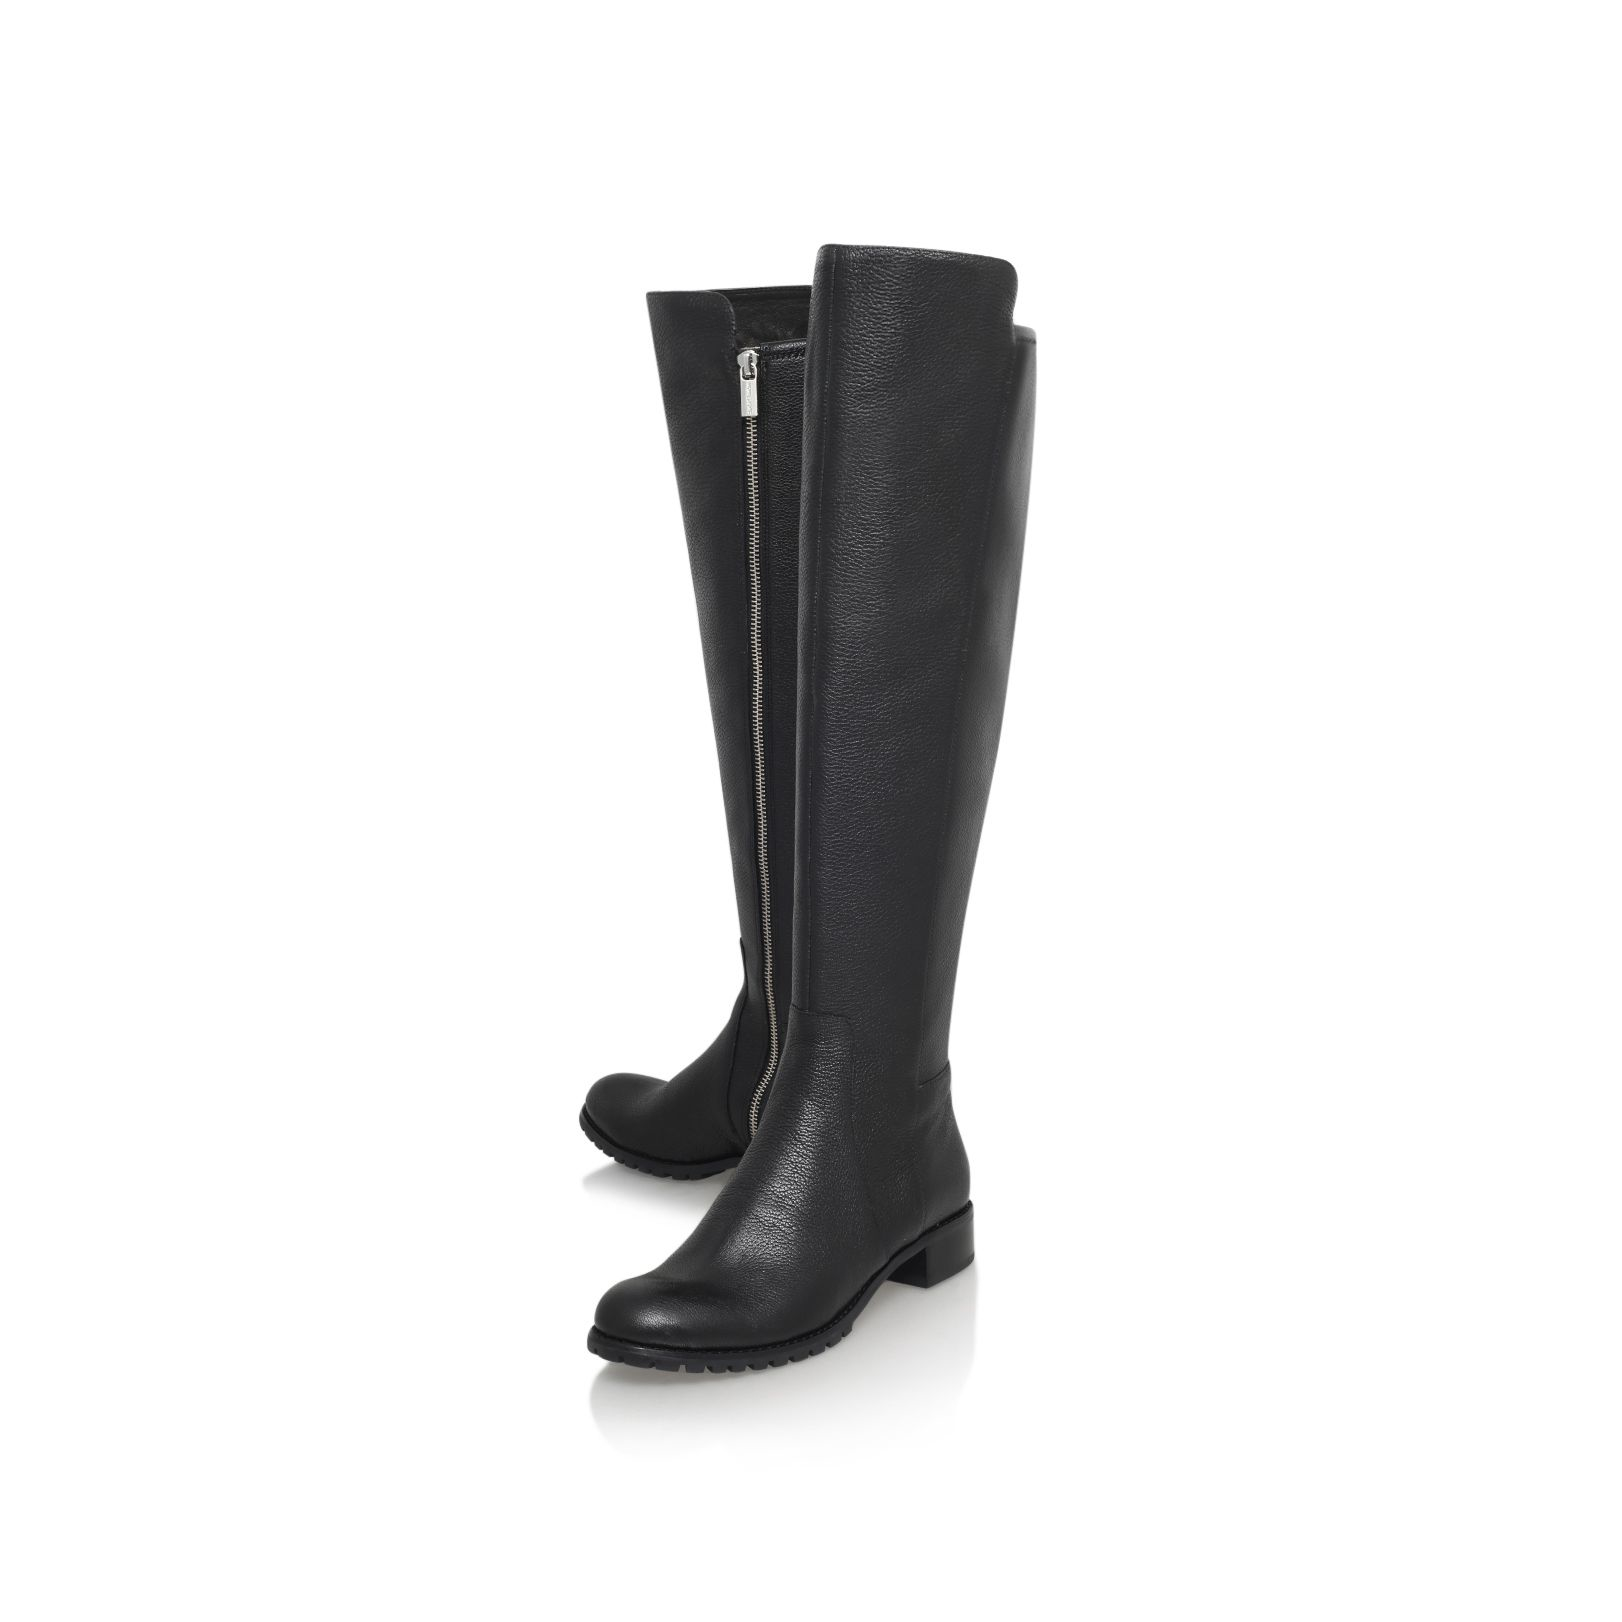 michael kors joanie boot low heel knee boots in black lyst